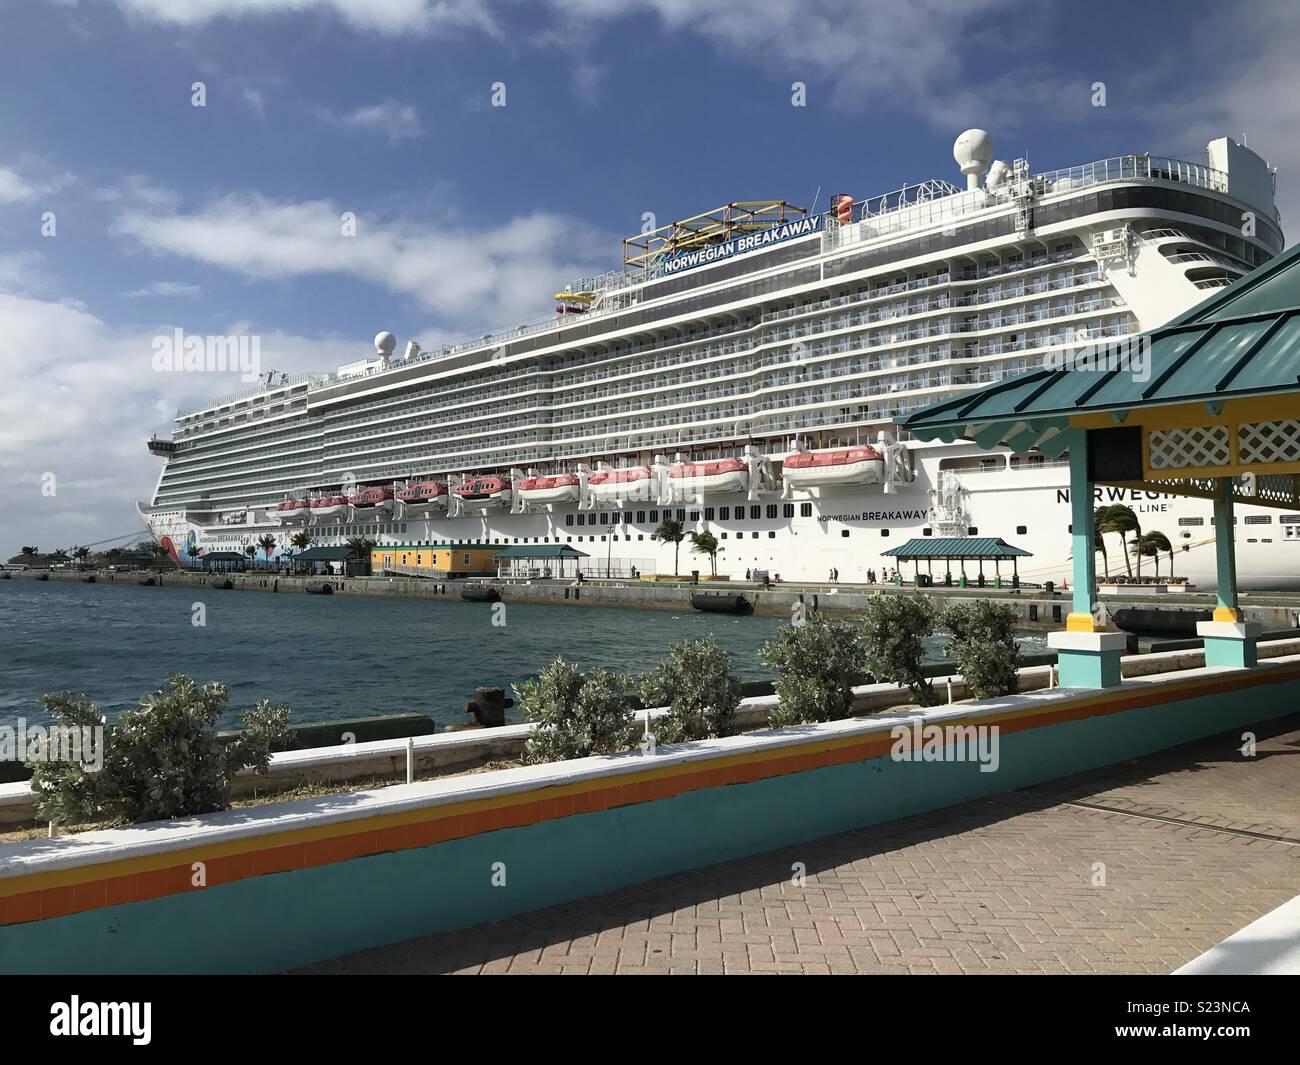 NCL Breakaway, Cruise Ship docked in Nassau. - Stock Image